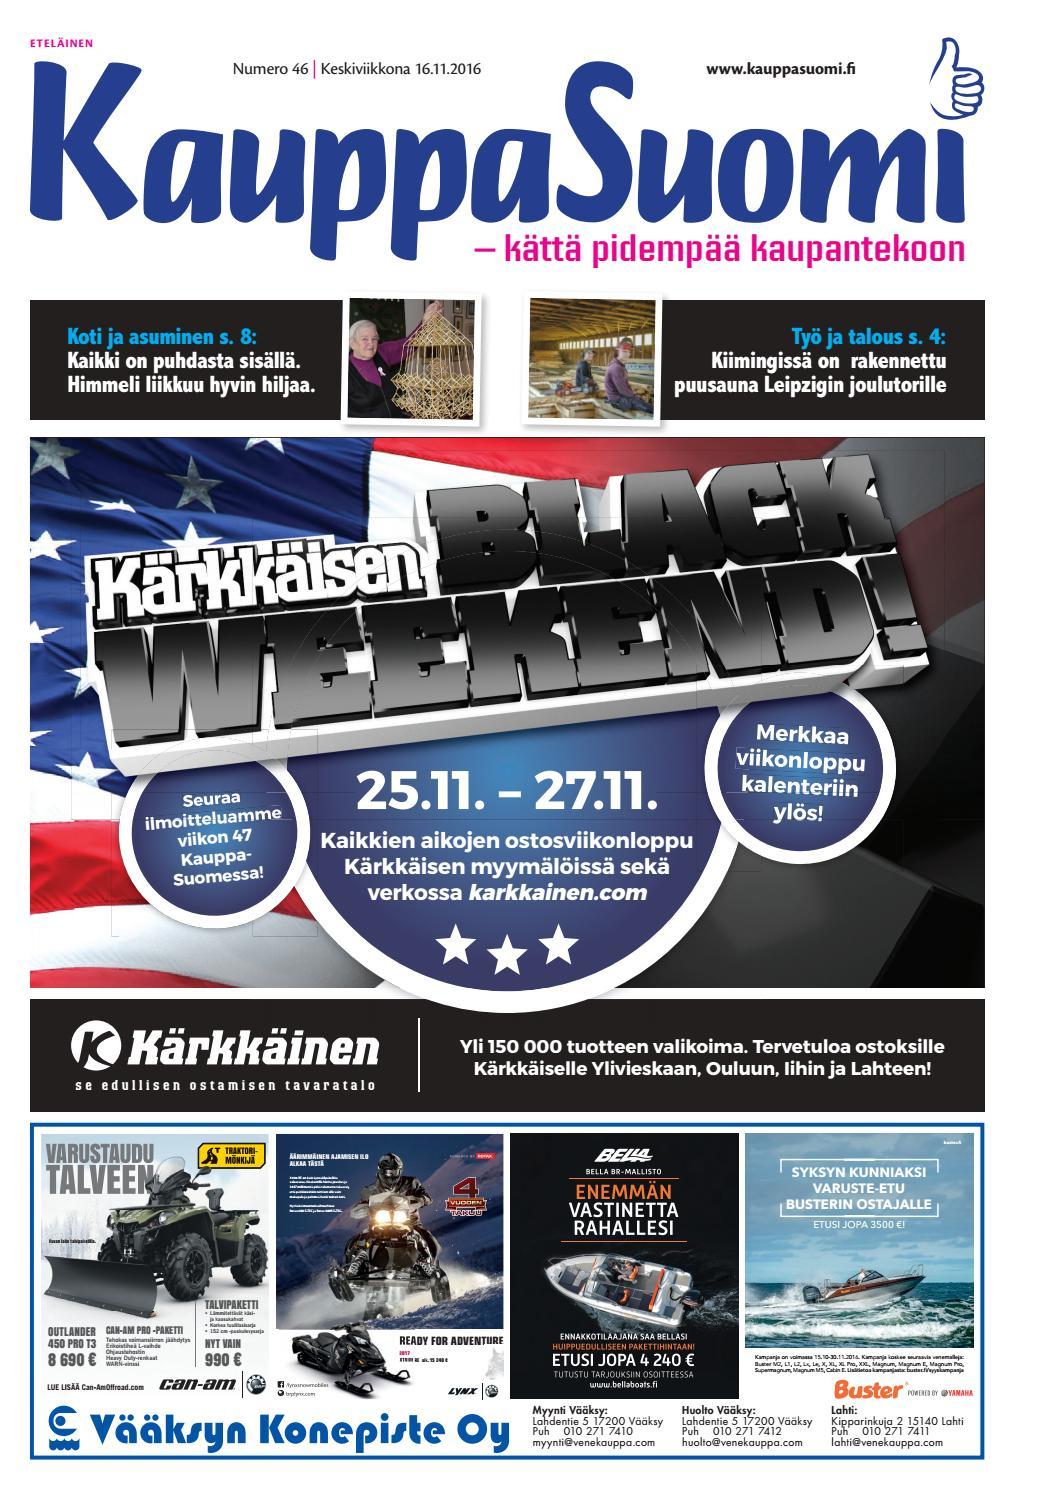 KauppaSuomi 46 2016 (E) by KauppaSuomi - issuu 561ce3a1a3